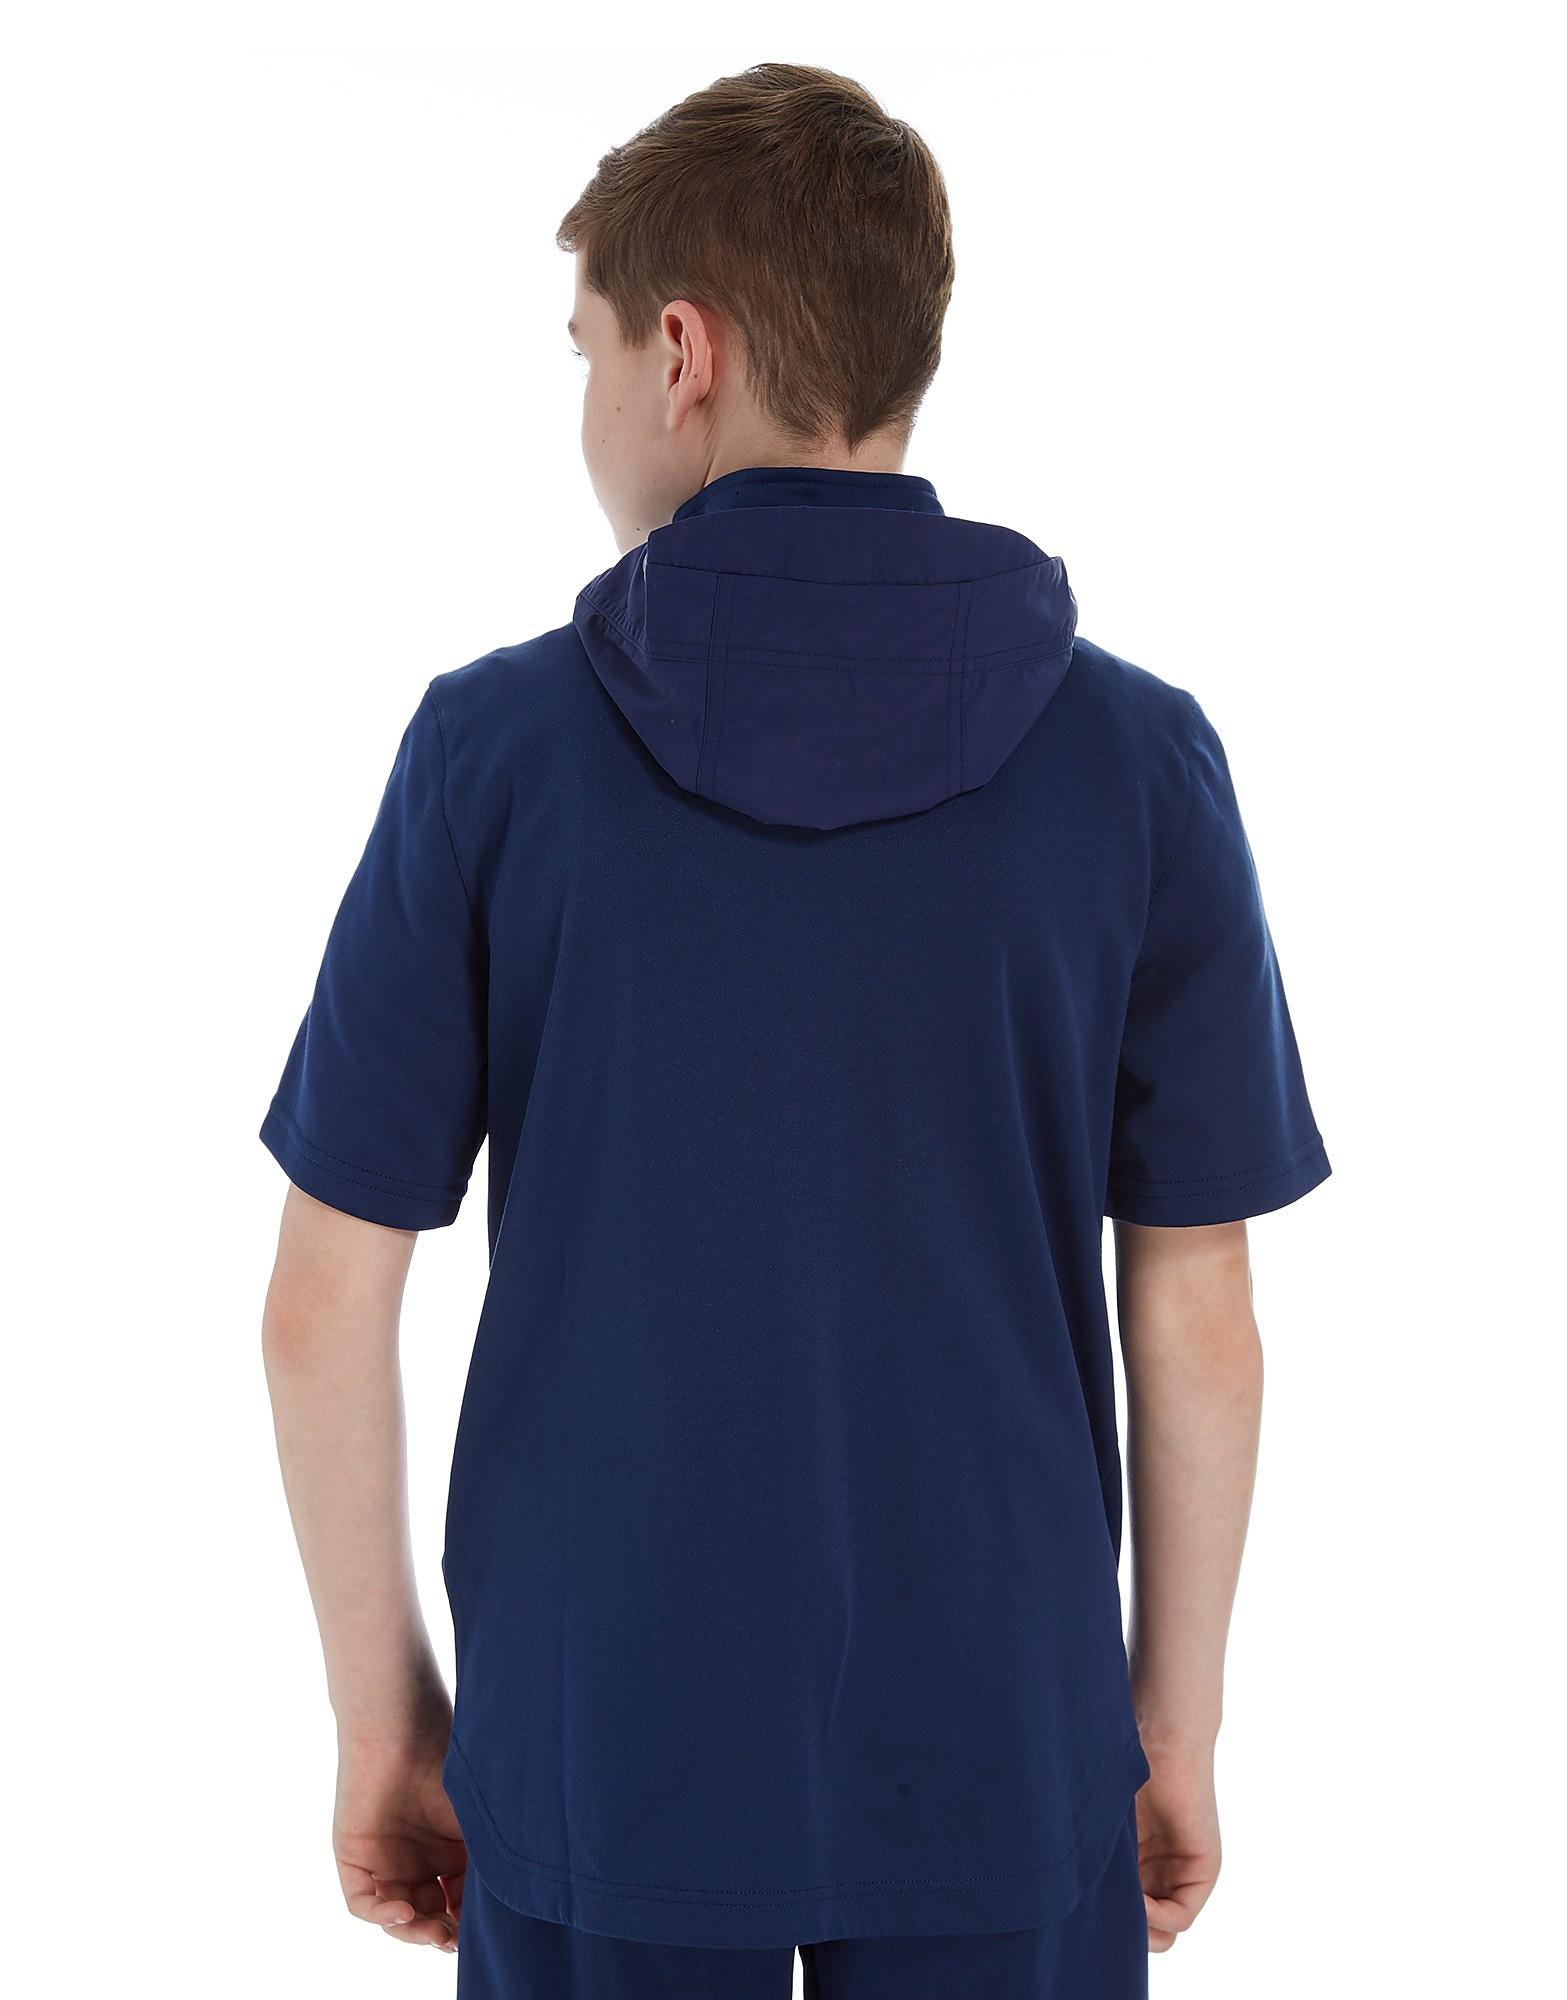 Nike Sportswear Short Sleeve Hoody Junior